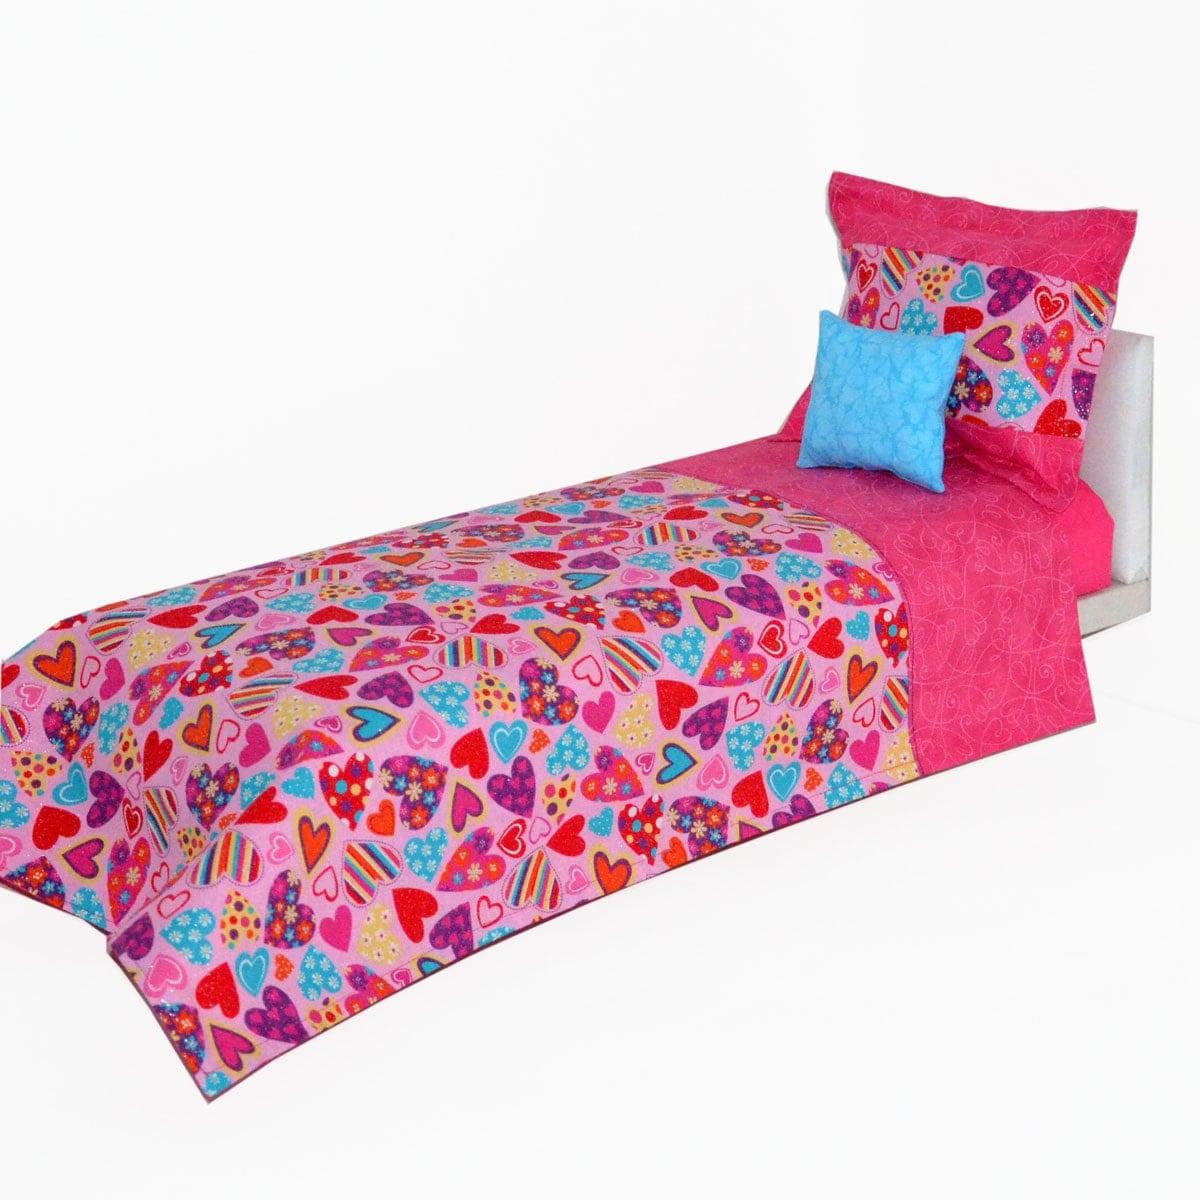 American Girl Mattress Bedding